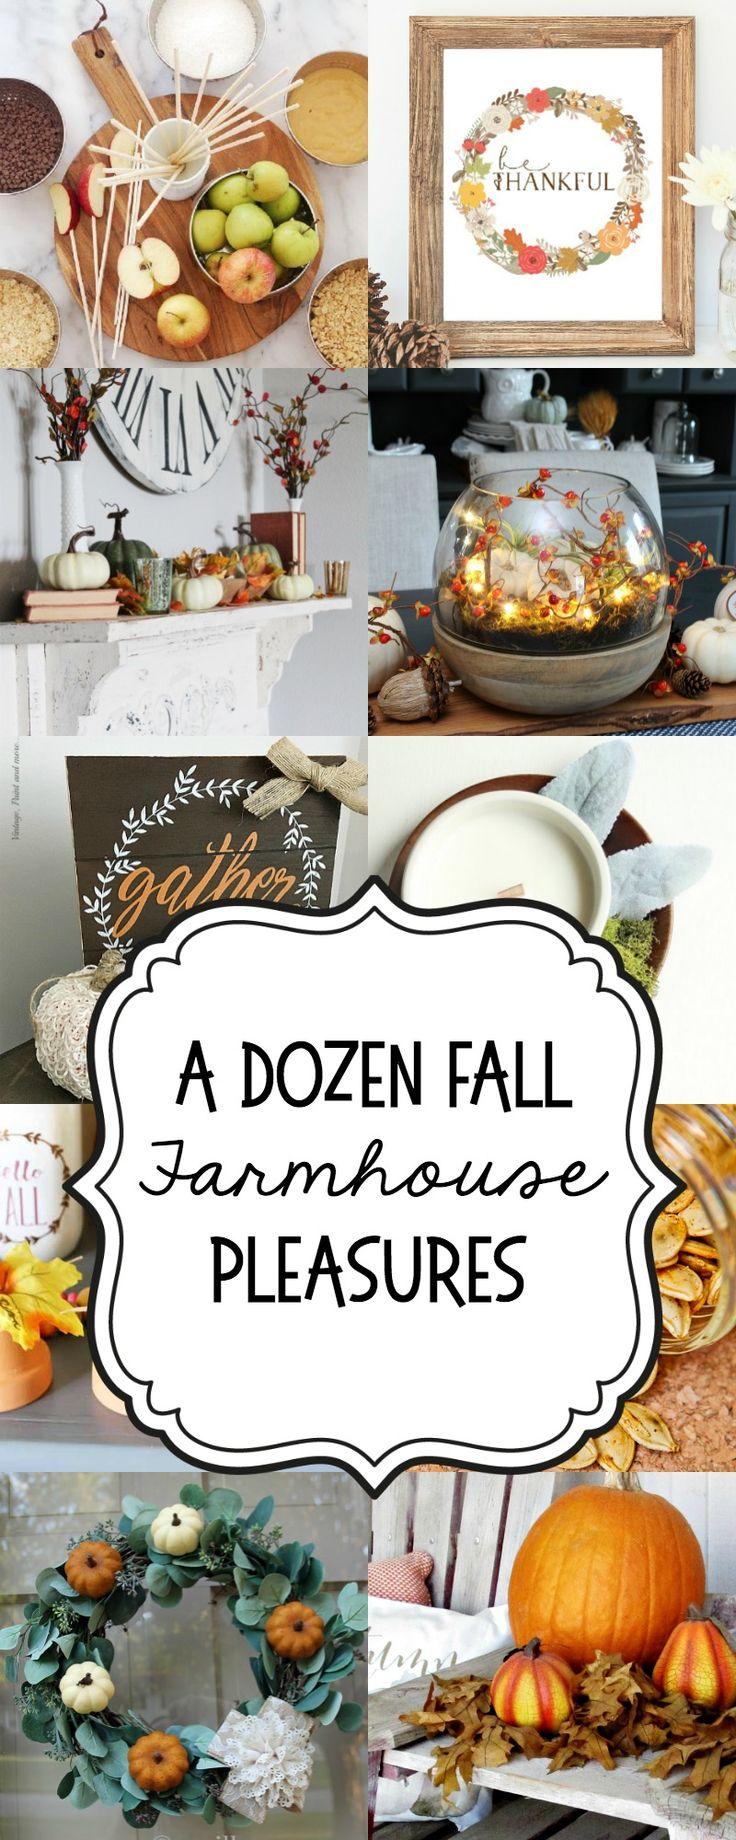 A Dozen Fall Farmhouse Pleasures to DIY and cook for autumn! fall | autumn | modern farmhouse | decor | rustic